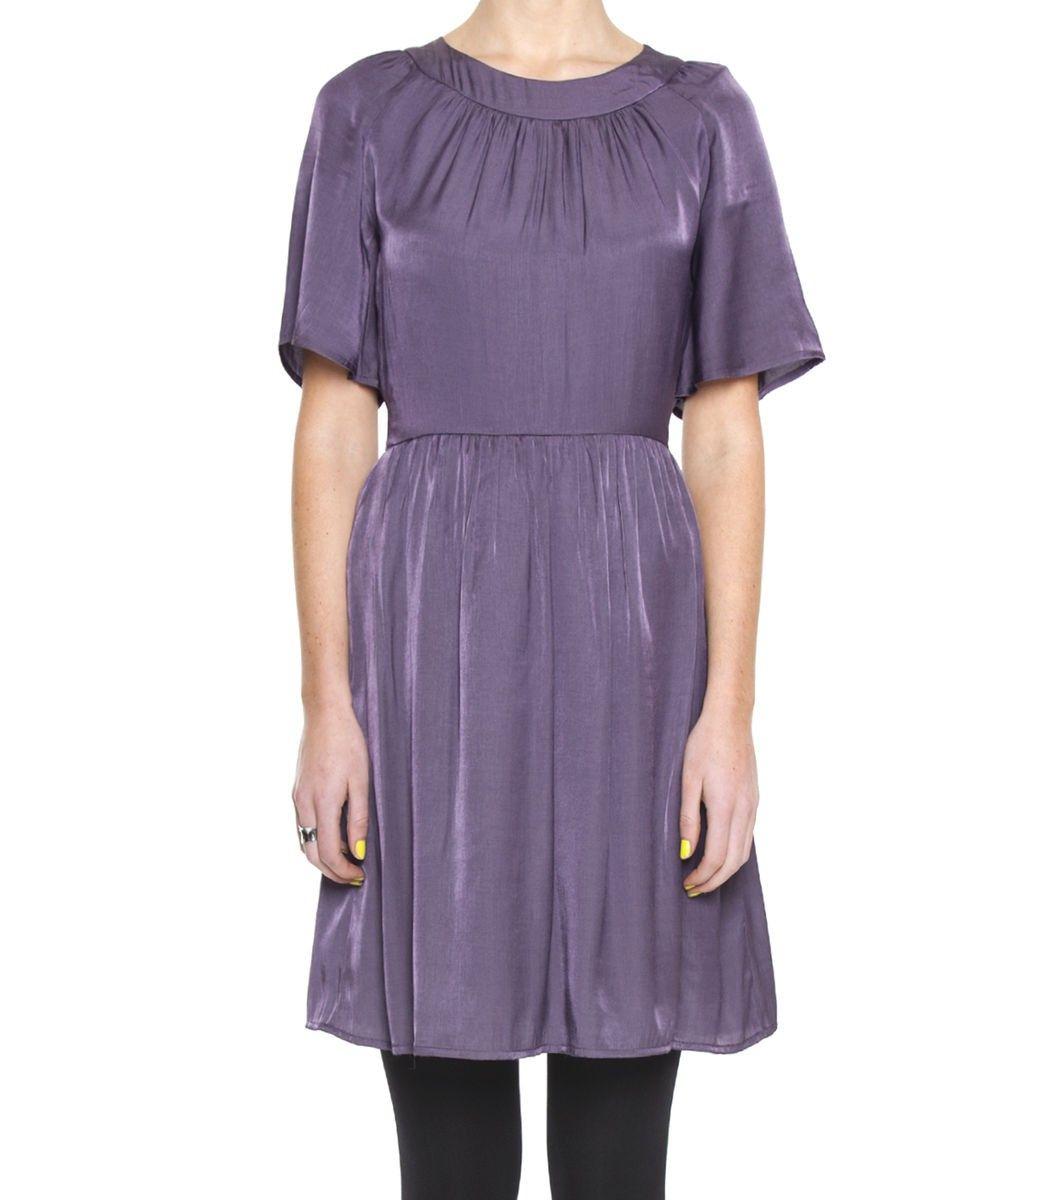 Absinthe & Alchemy Dress in Amethyst - Friends of Couture ~ #Dangerfield